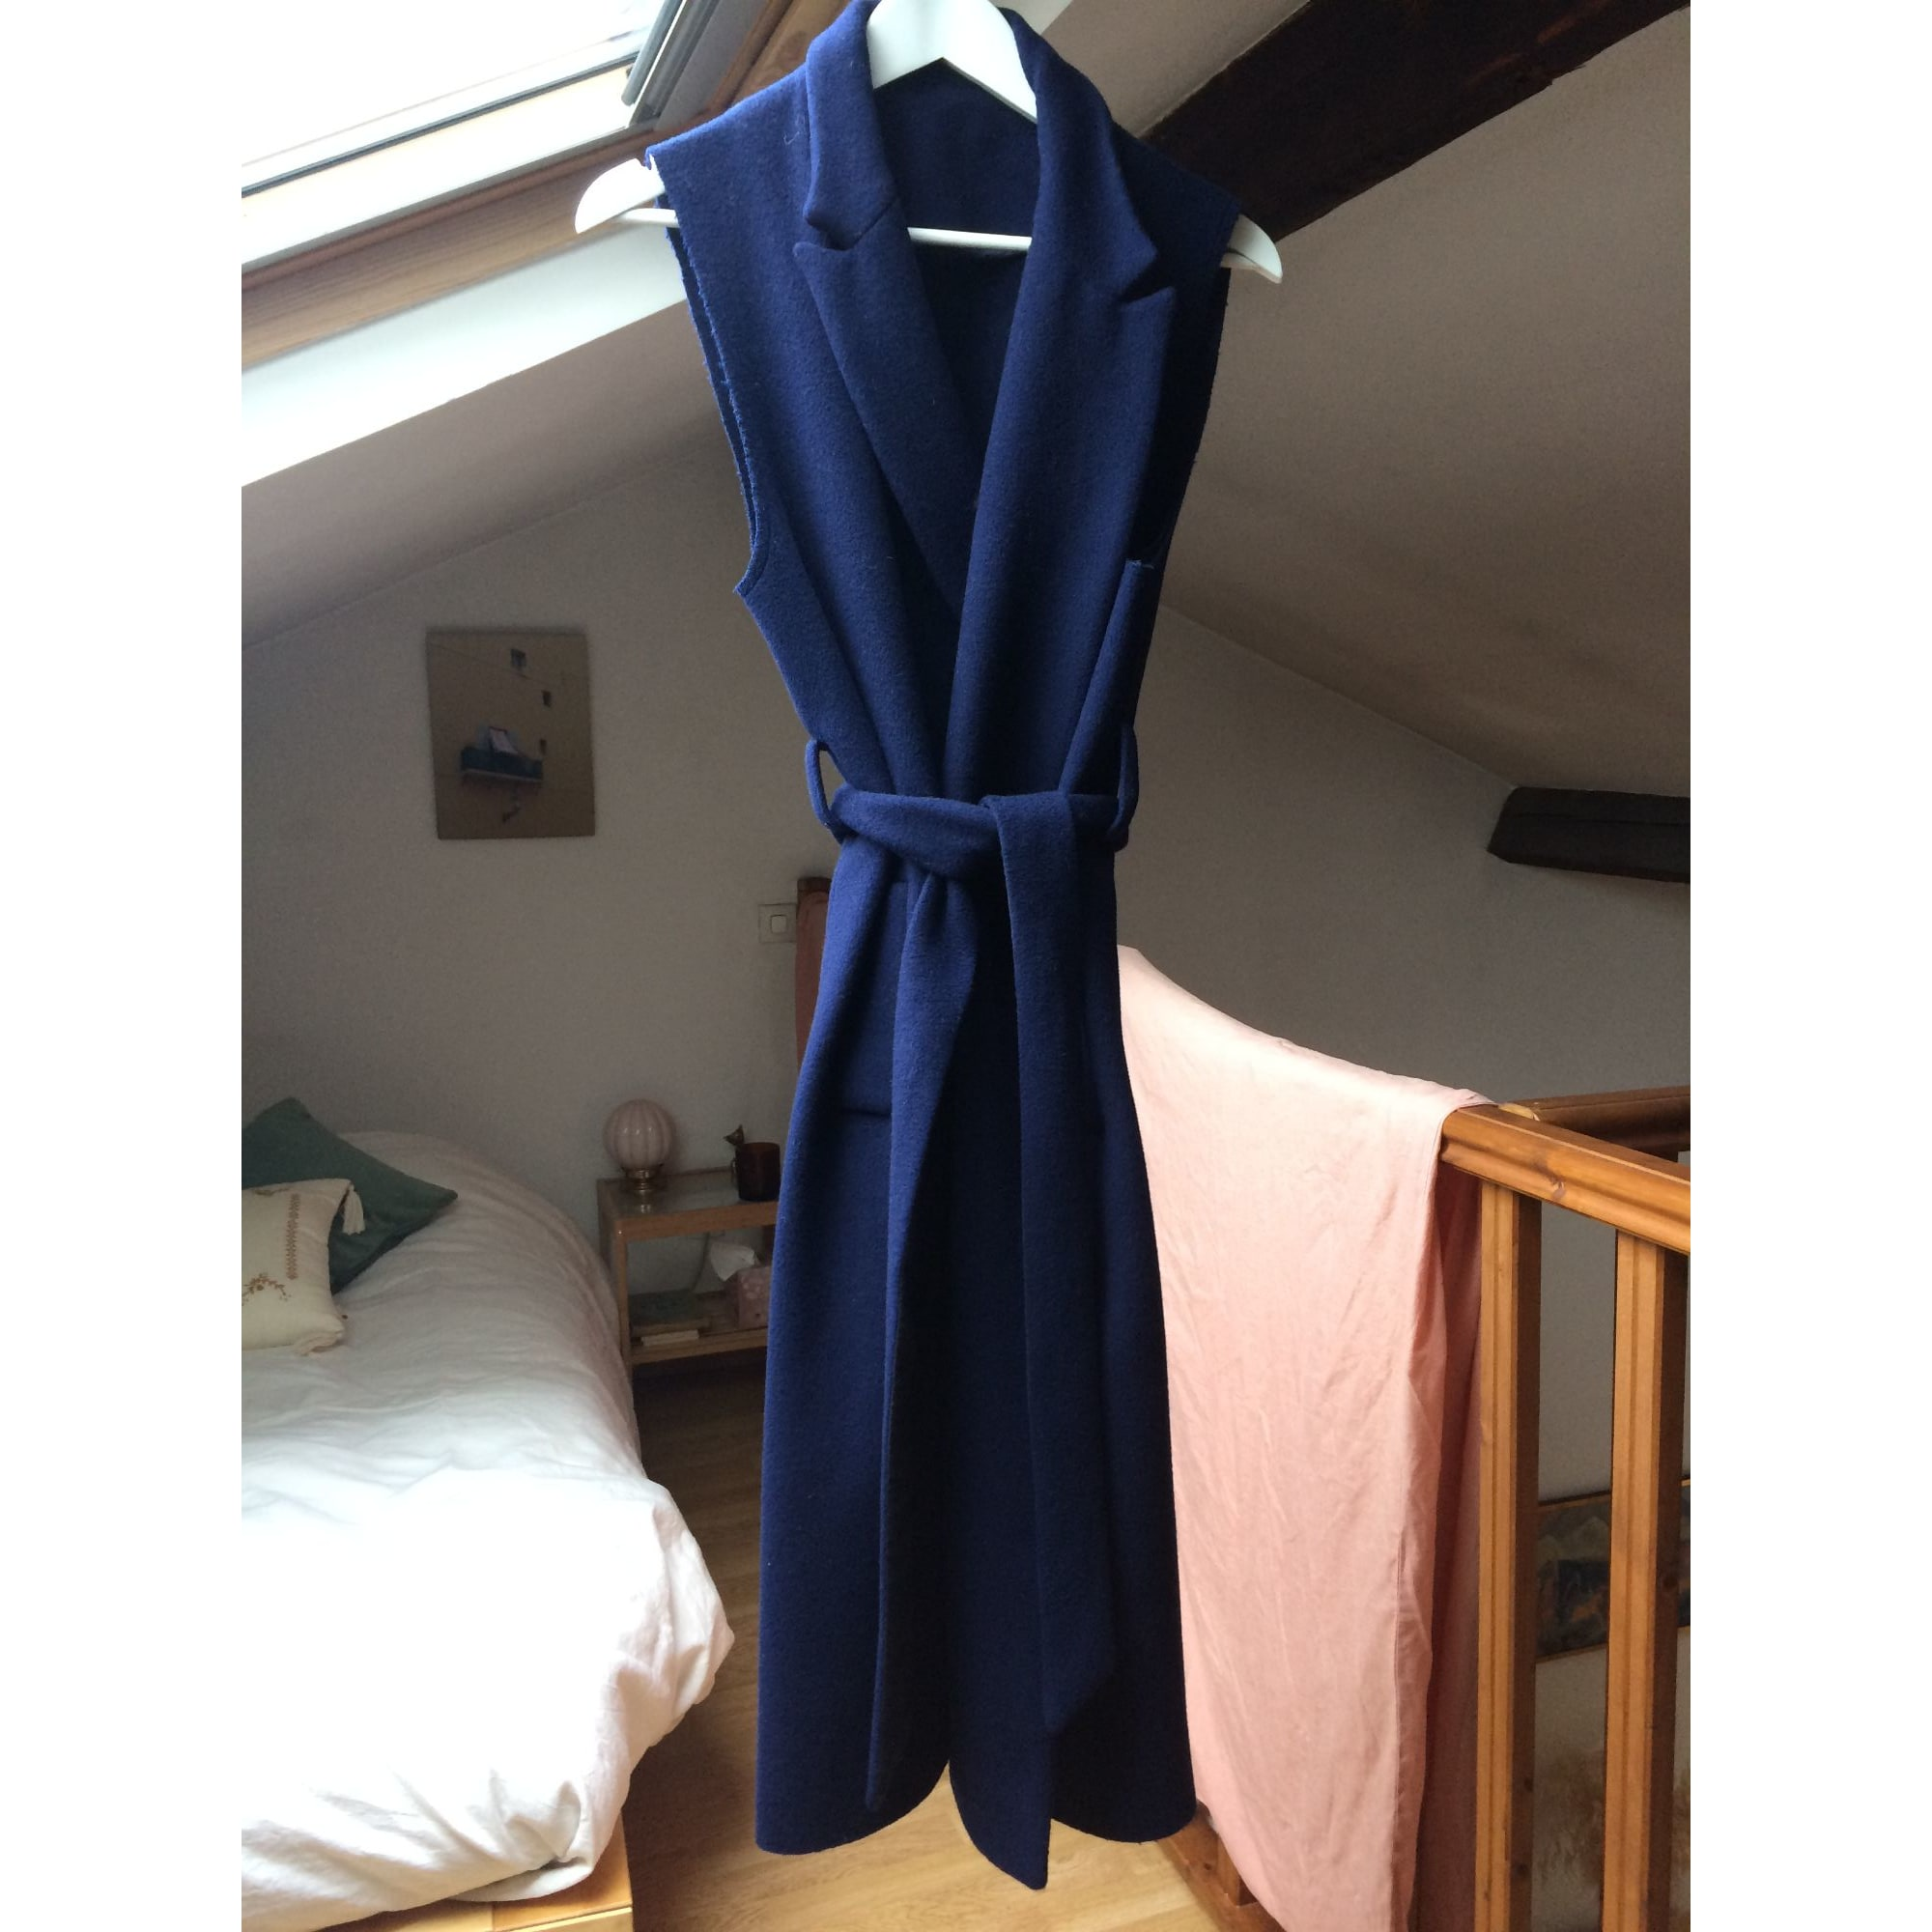 Manteau VINTAGE Bleu, bleu marine, bleu turquoise